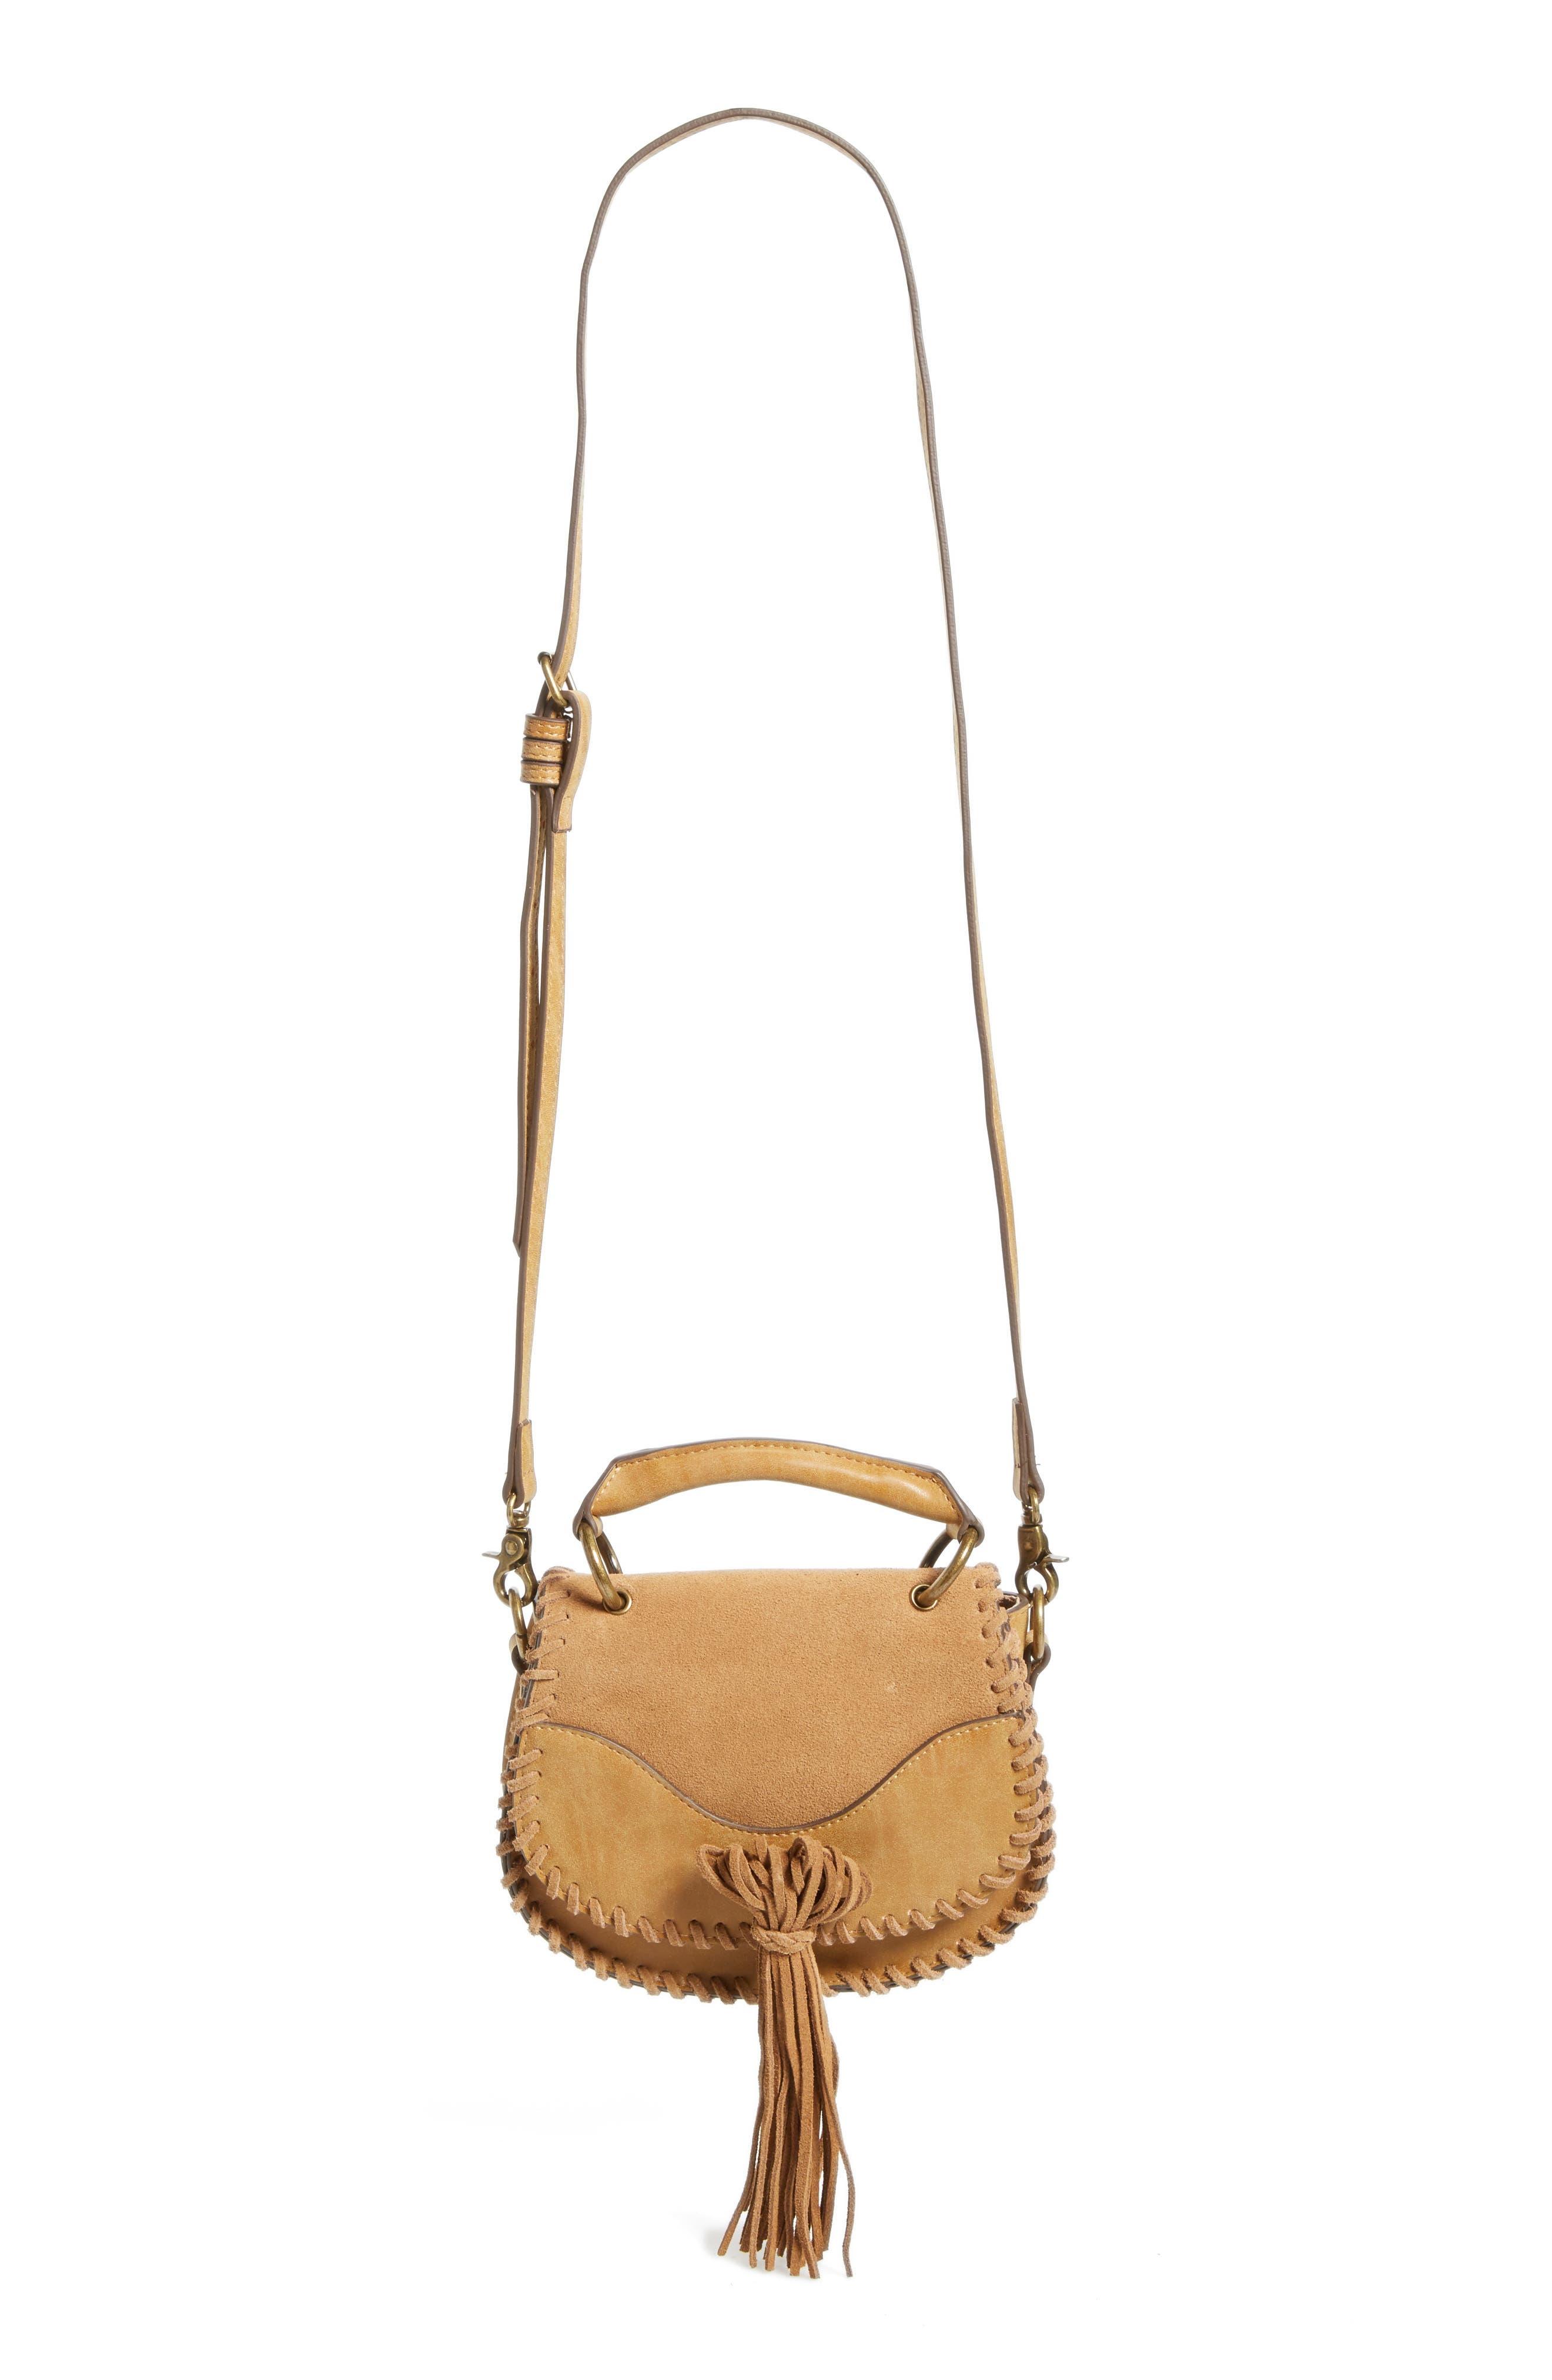 Main Image - Elle & Jae Gypset Mini Madrid Faux Leather Top Handle Saddle Bag